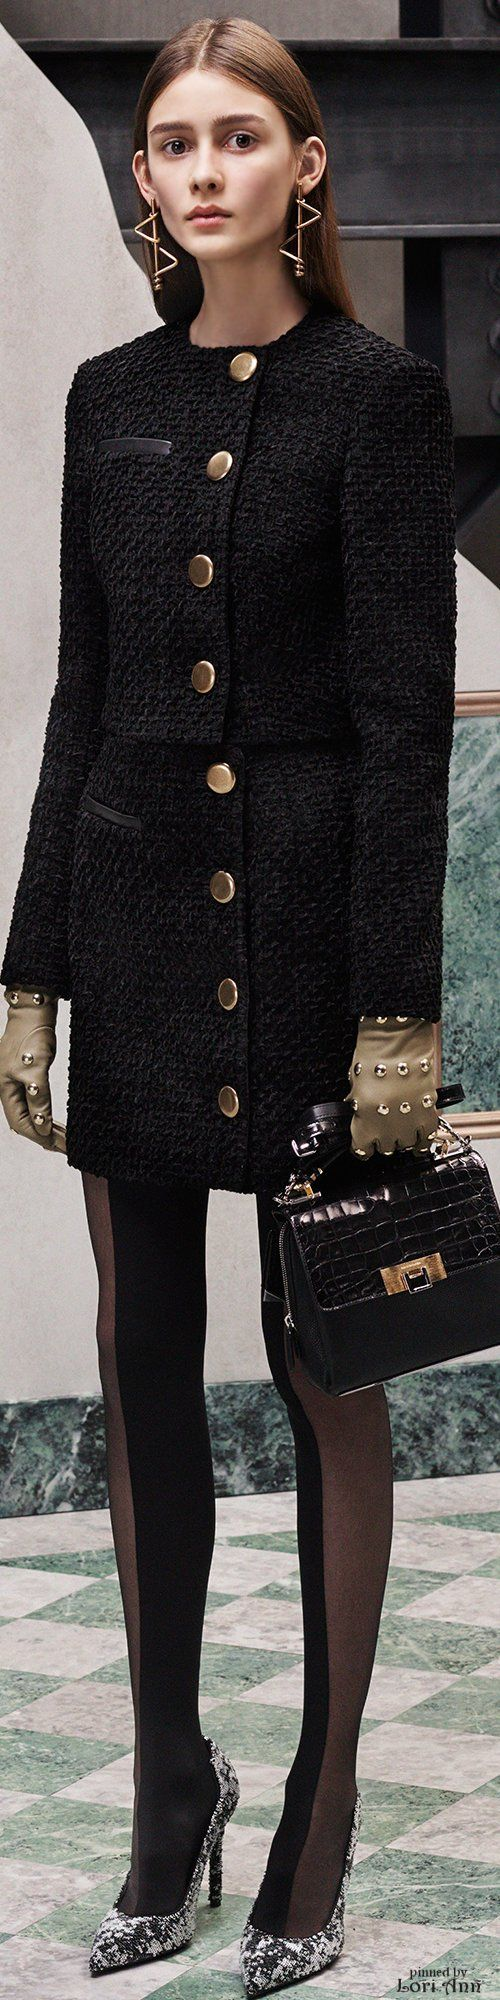 Street fashion / karen cox. Balenciaga Pre-Fall 2015